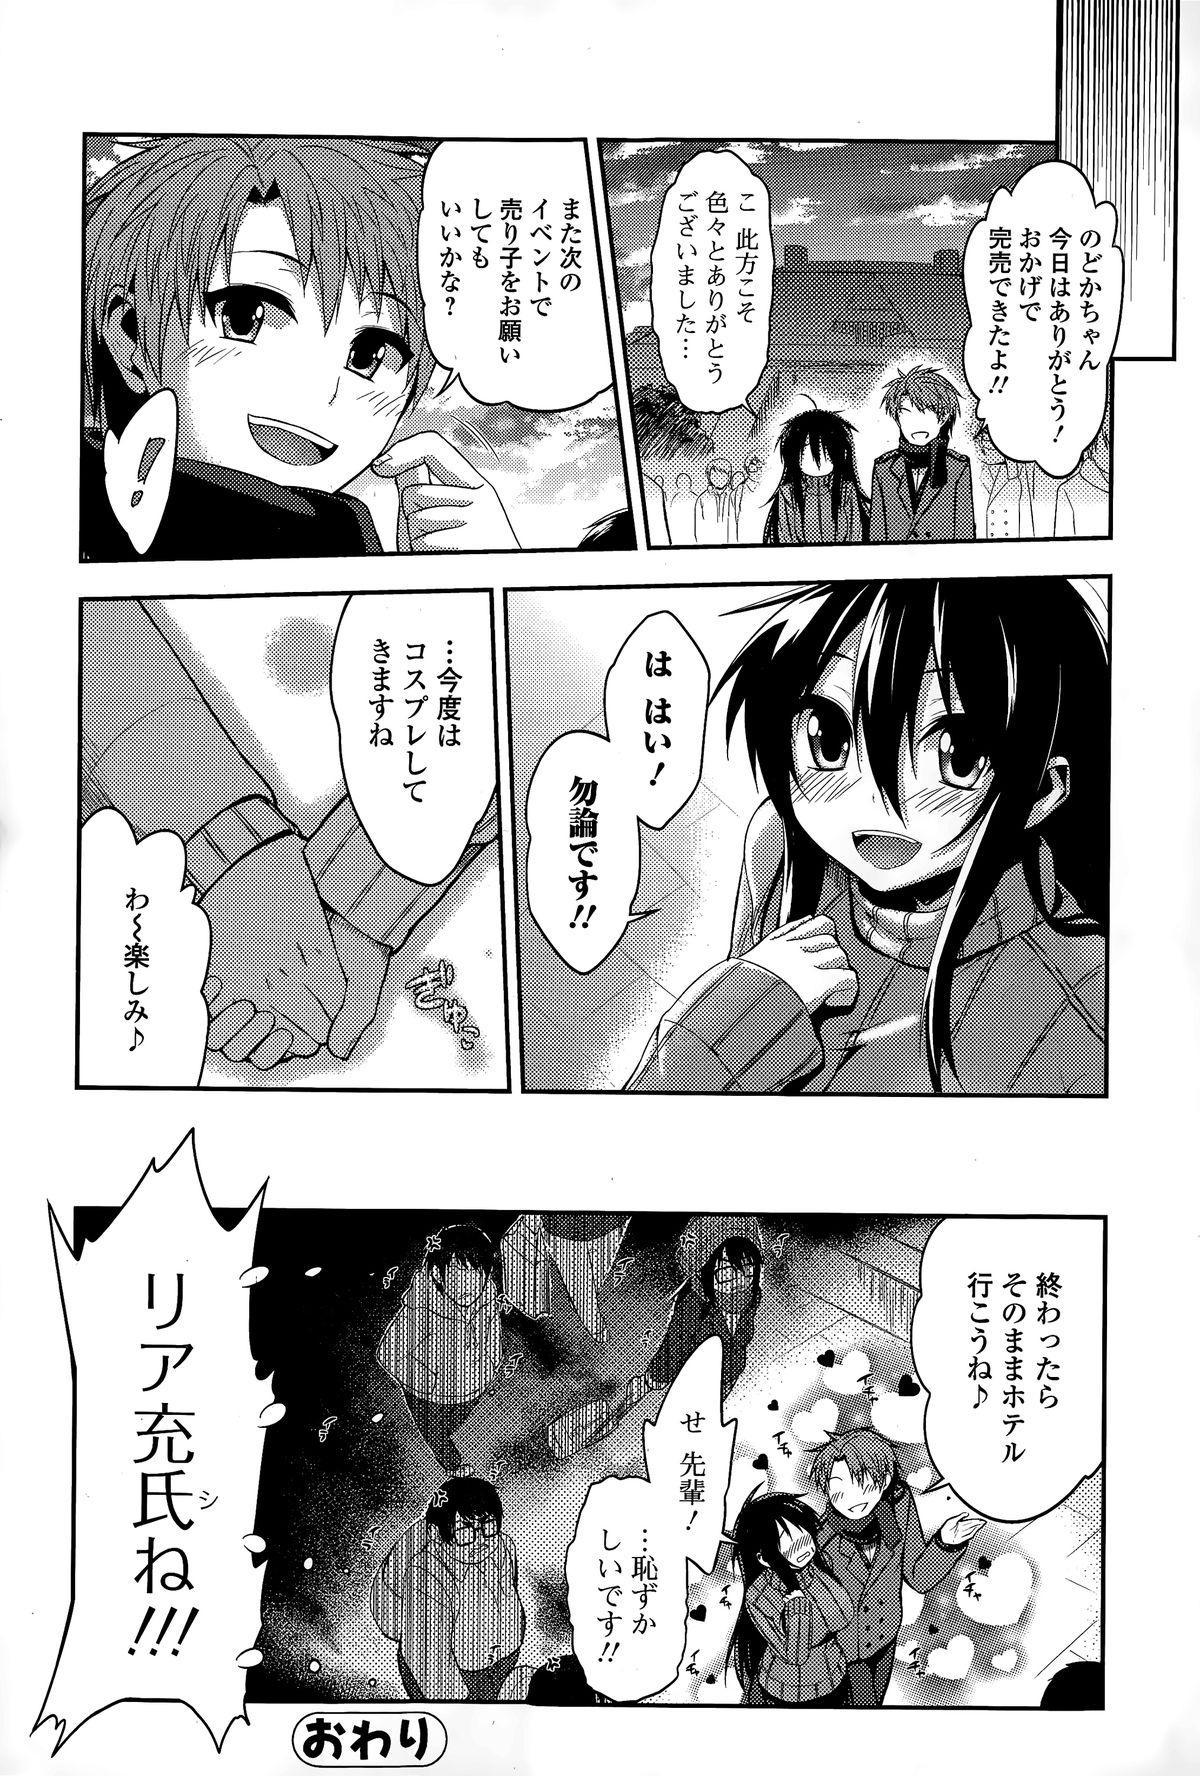 Comic Toutetsu 2015-02 Vol. 3 77